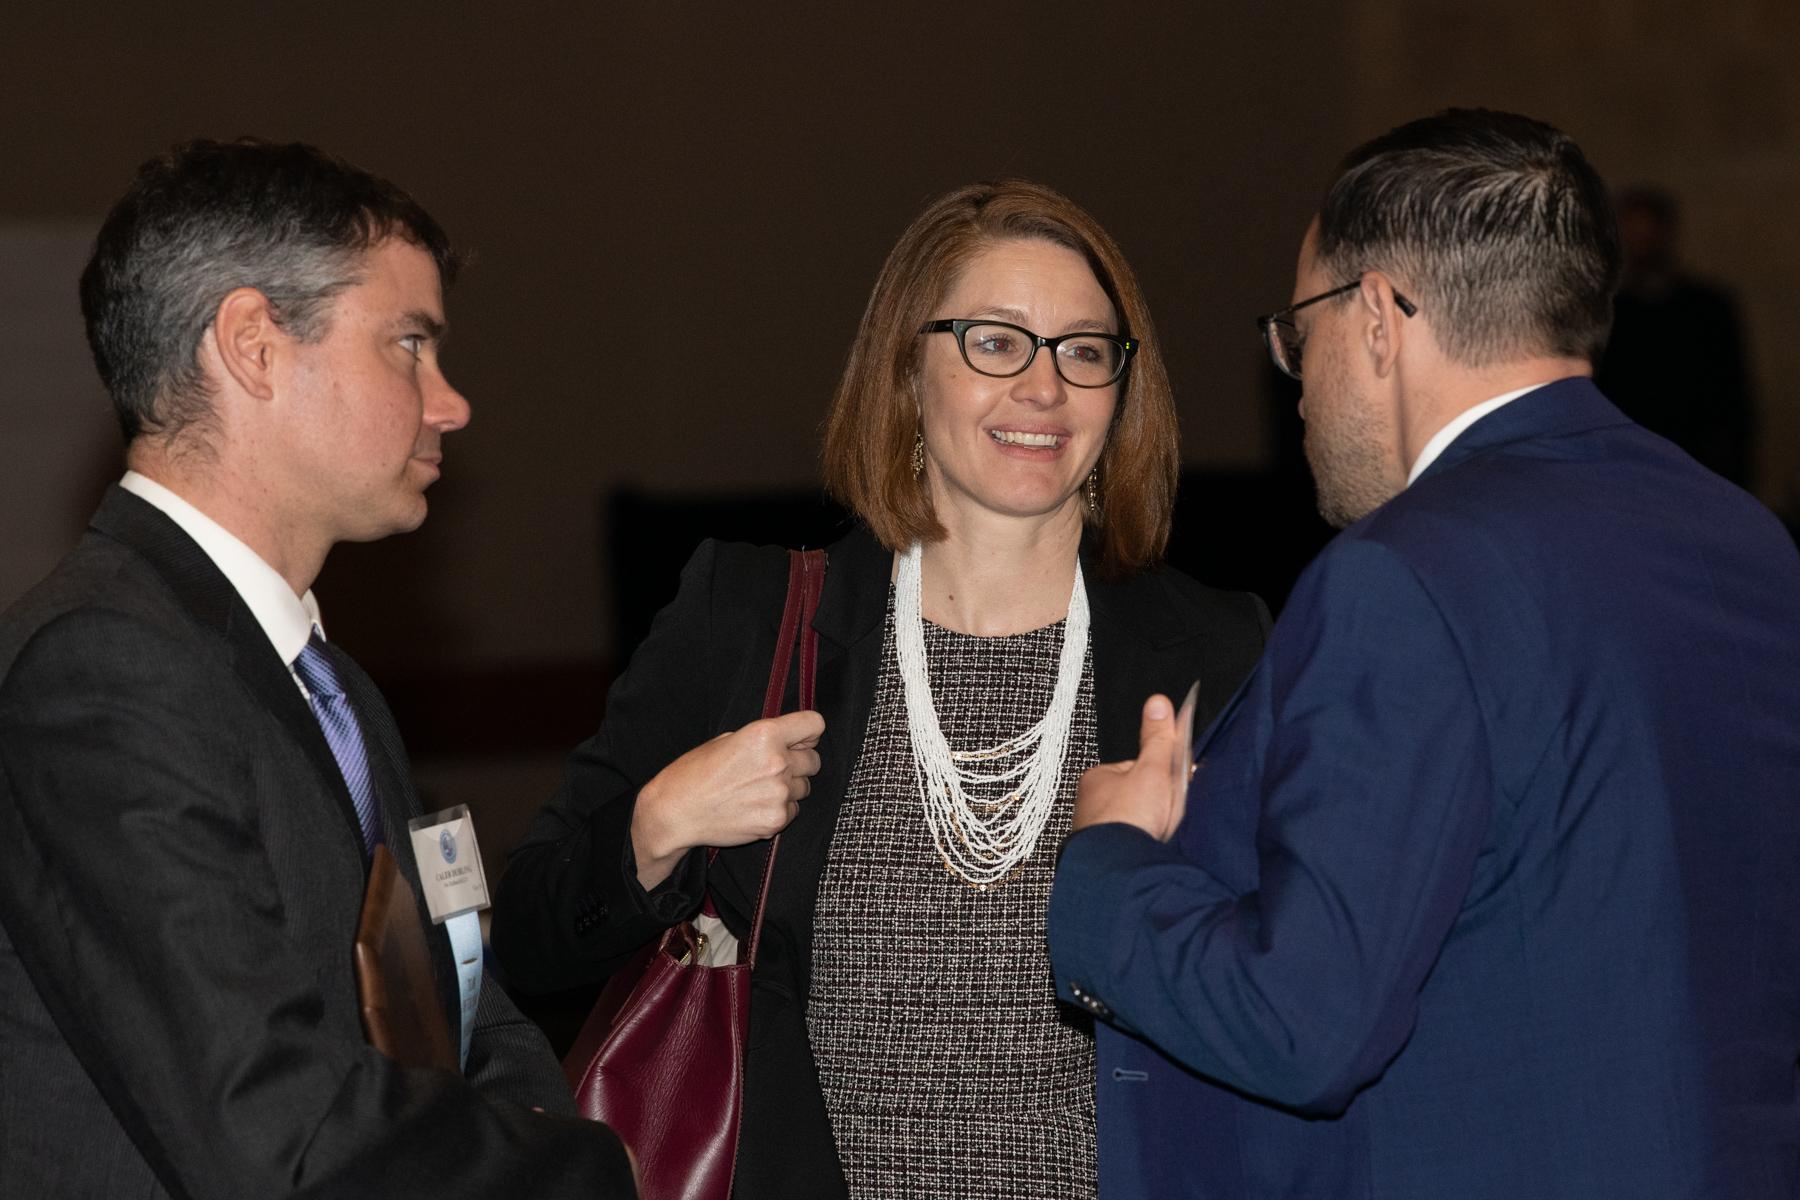 _DSC7552 Caleb Durling, Michelle Berge & Nick Mitchell (courtesy of Hartmannphoto).jpg